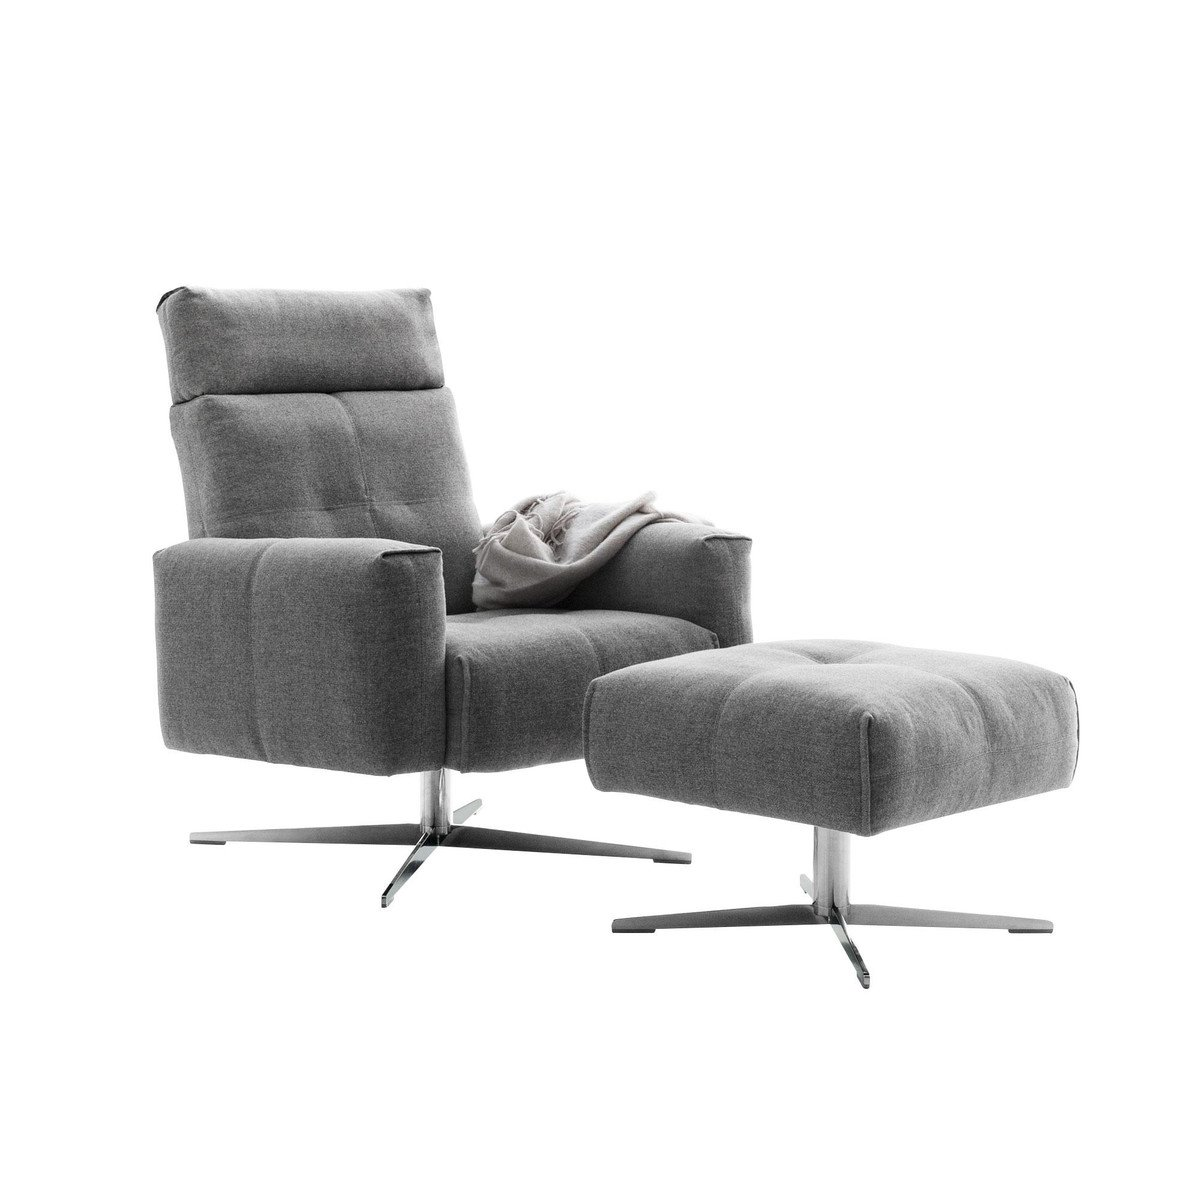 Rolf Benz 50 Sessel mit Hocker | Rolf Benz | AmbienteDirect.com